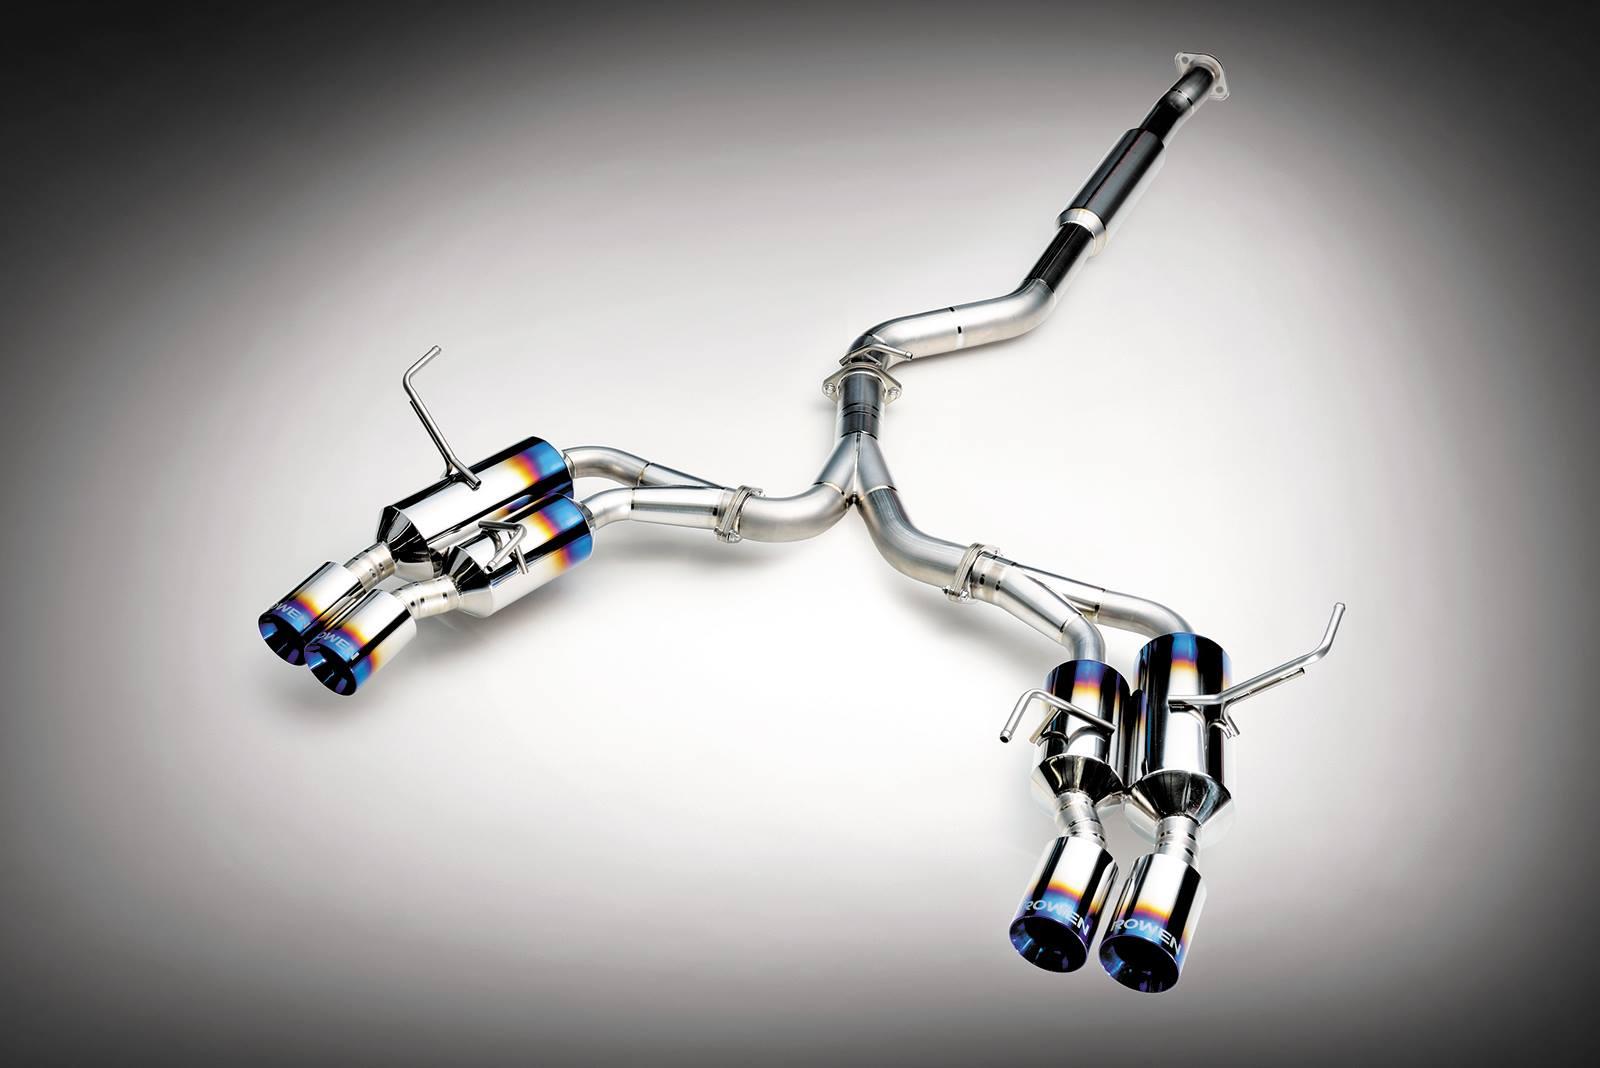 2015 Subaru Wrx Exhaust >> 2015 Subaru WRX STI Gets Titanium Exhaust from Rowen - autoevolution